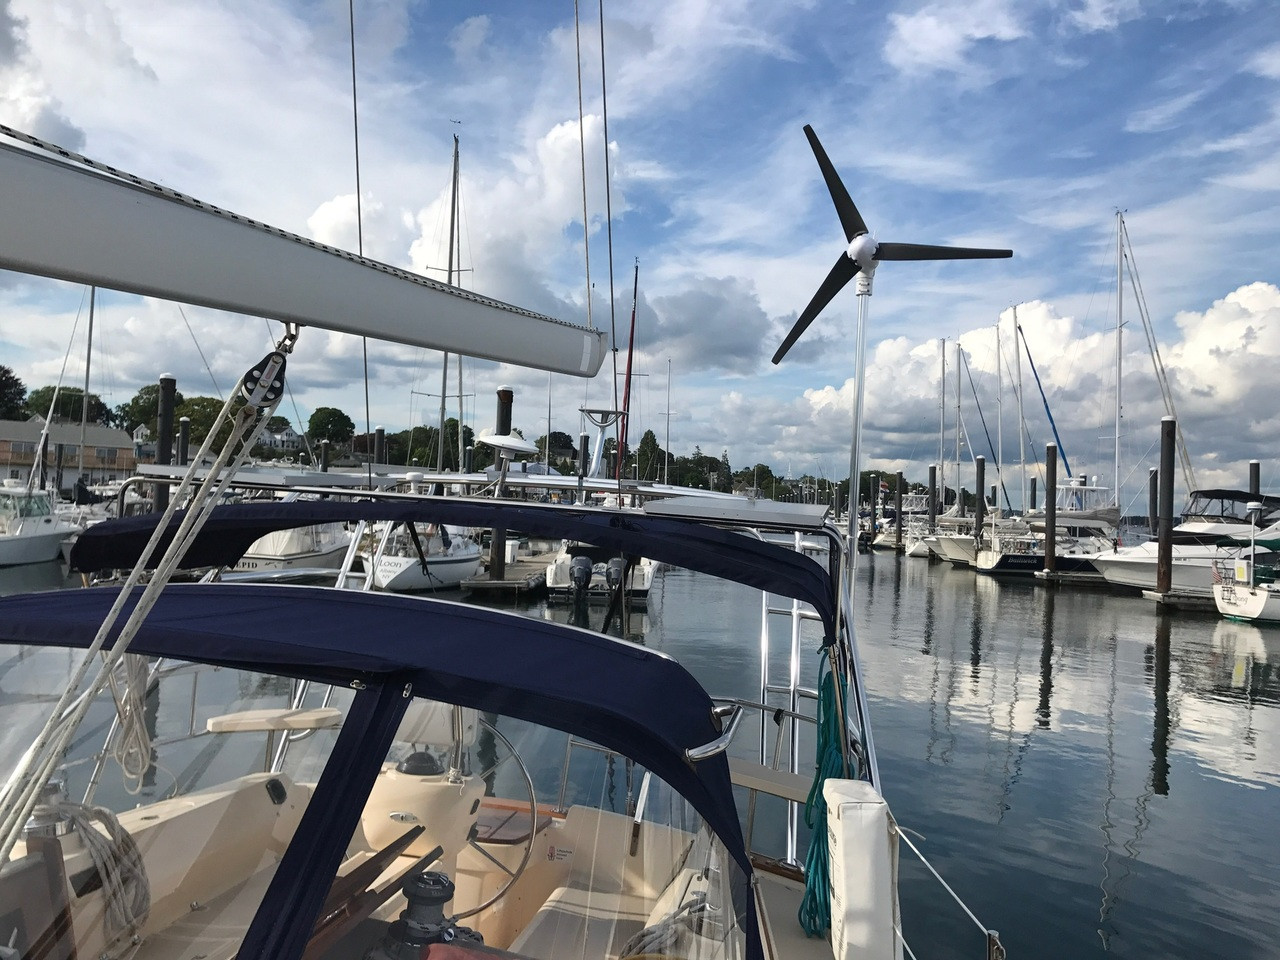 Arch-mounted Marine Kinetix MK4+ on Steve  Lazrove's sailboat.